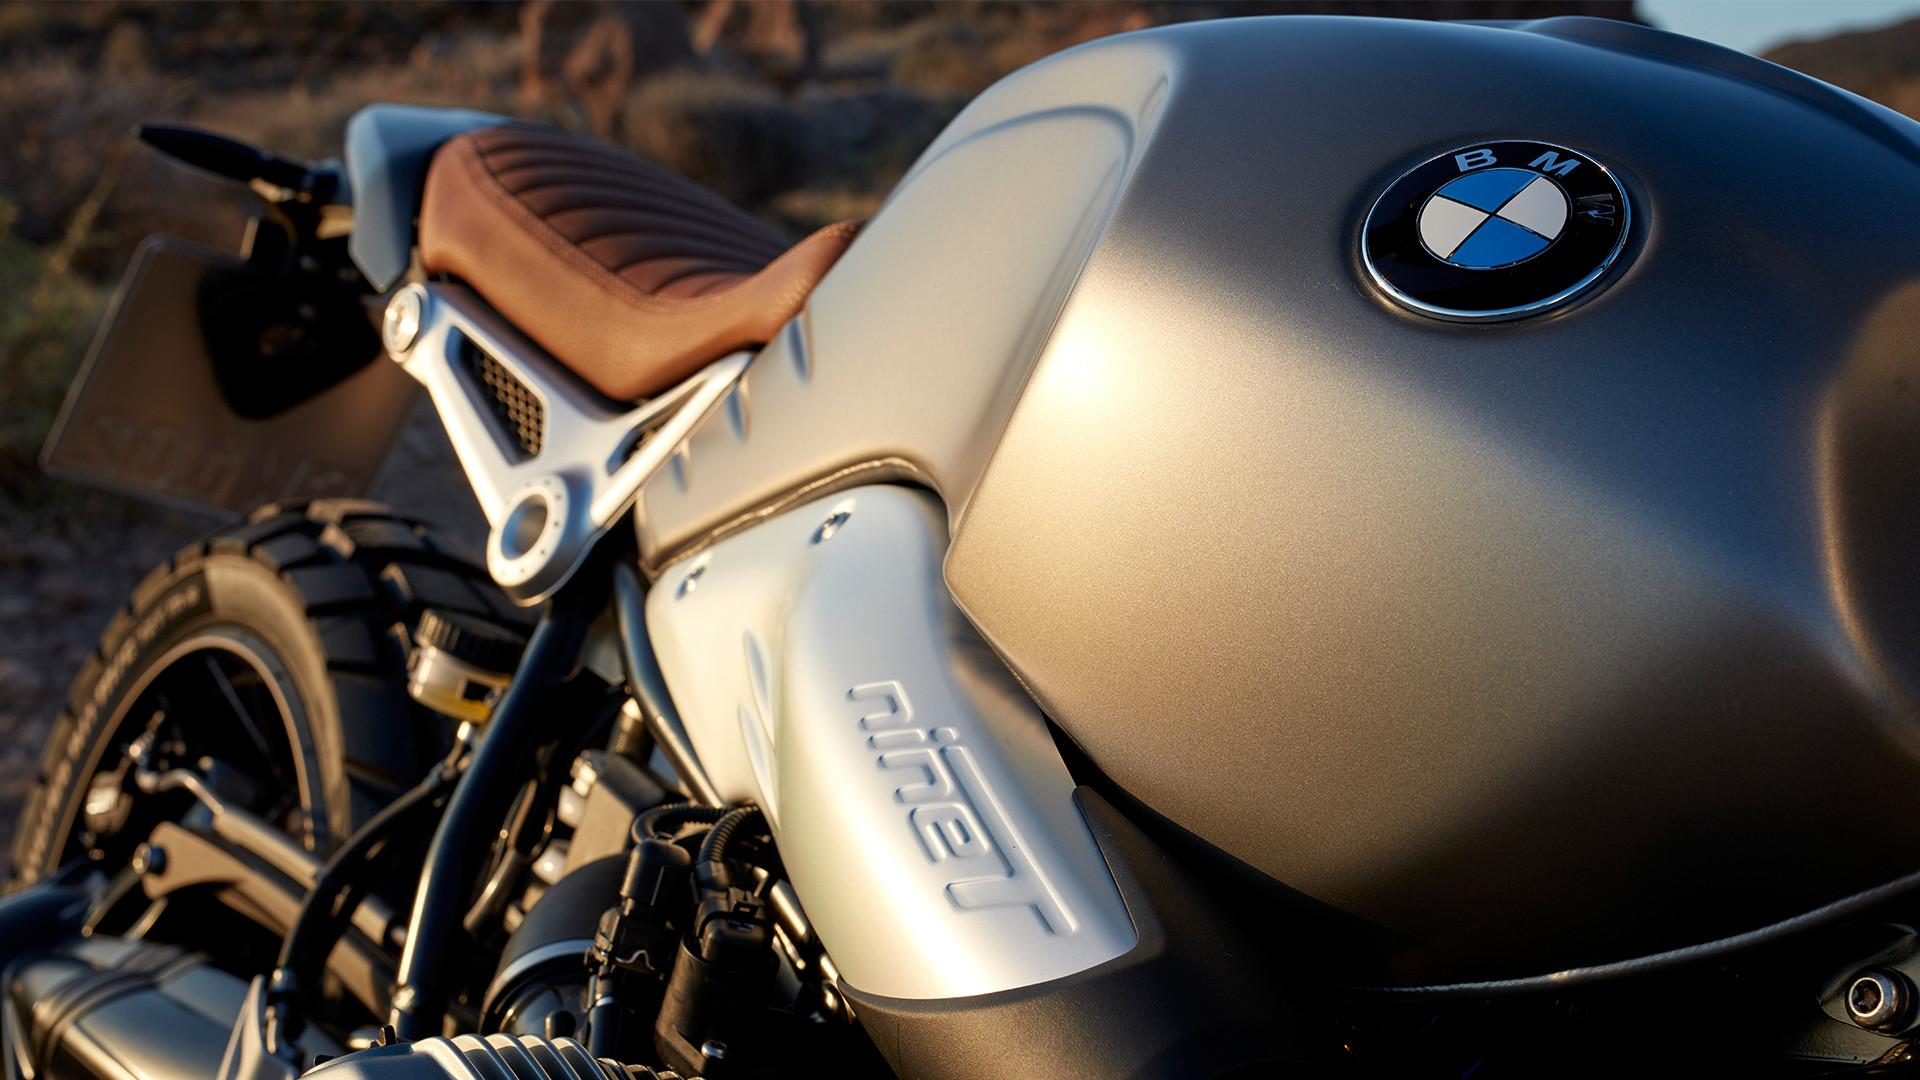 R nineT Scrambler | Southern California BMW Motorcycle Dealers